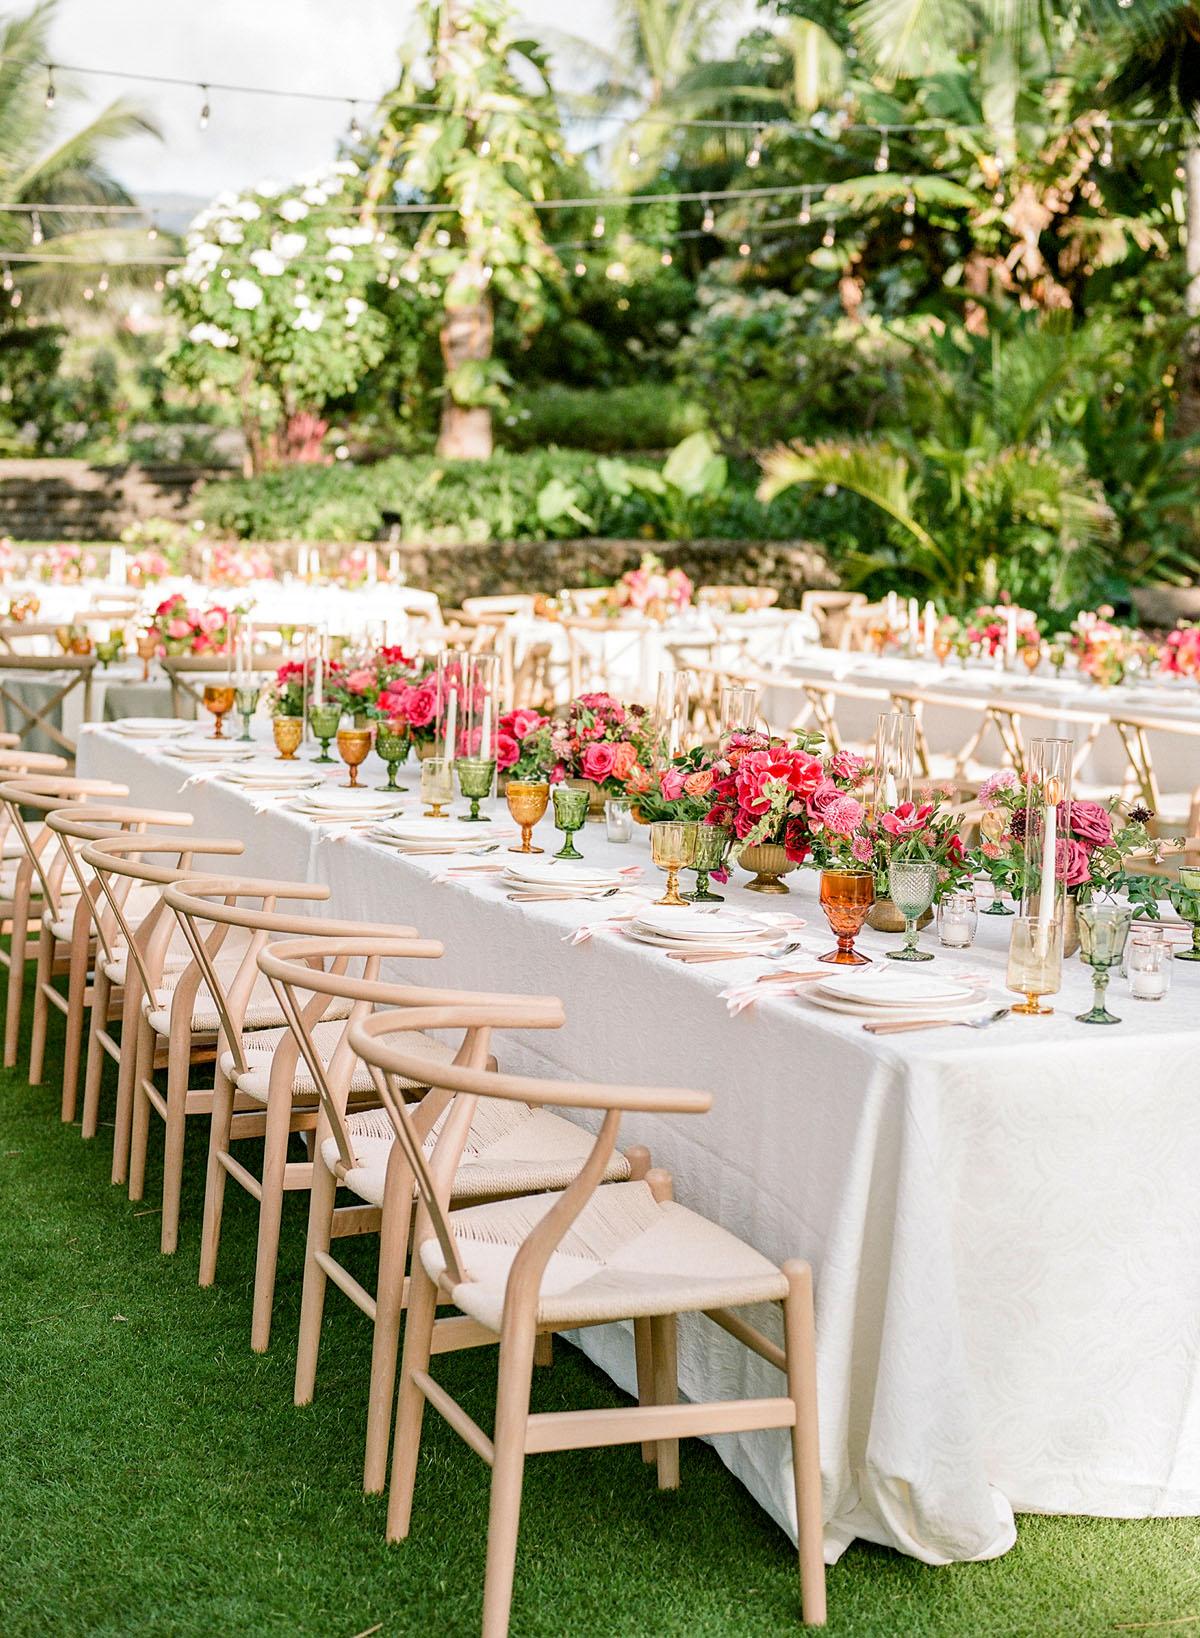 41-tropical-wedding-decor.jpg